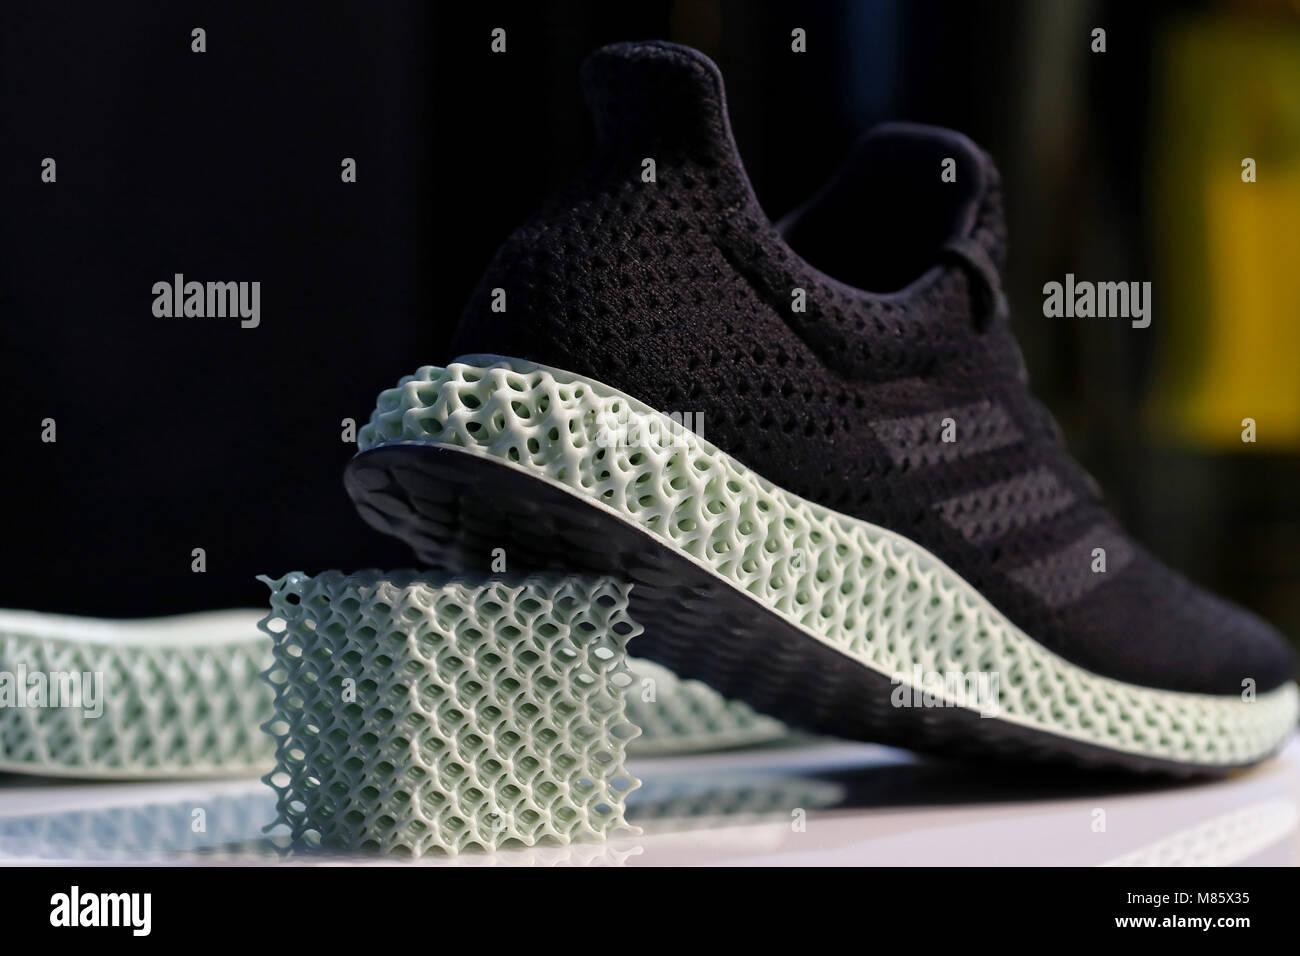 9bc2b3cb 14 March 2018, Germany, Herzogenaurach: The adidas logo on a shoe with a